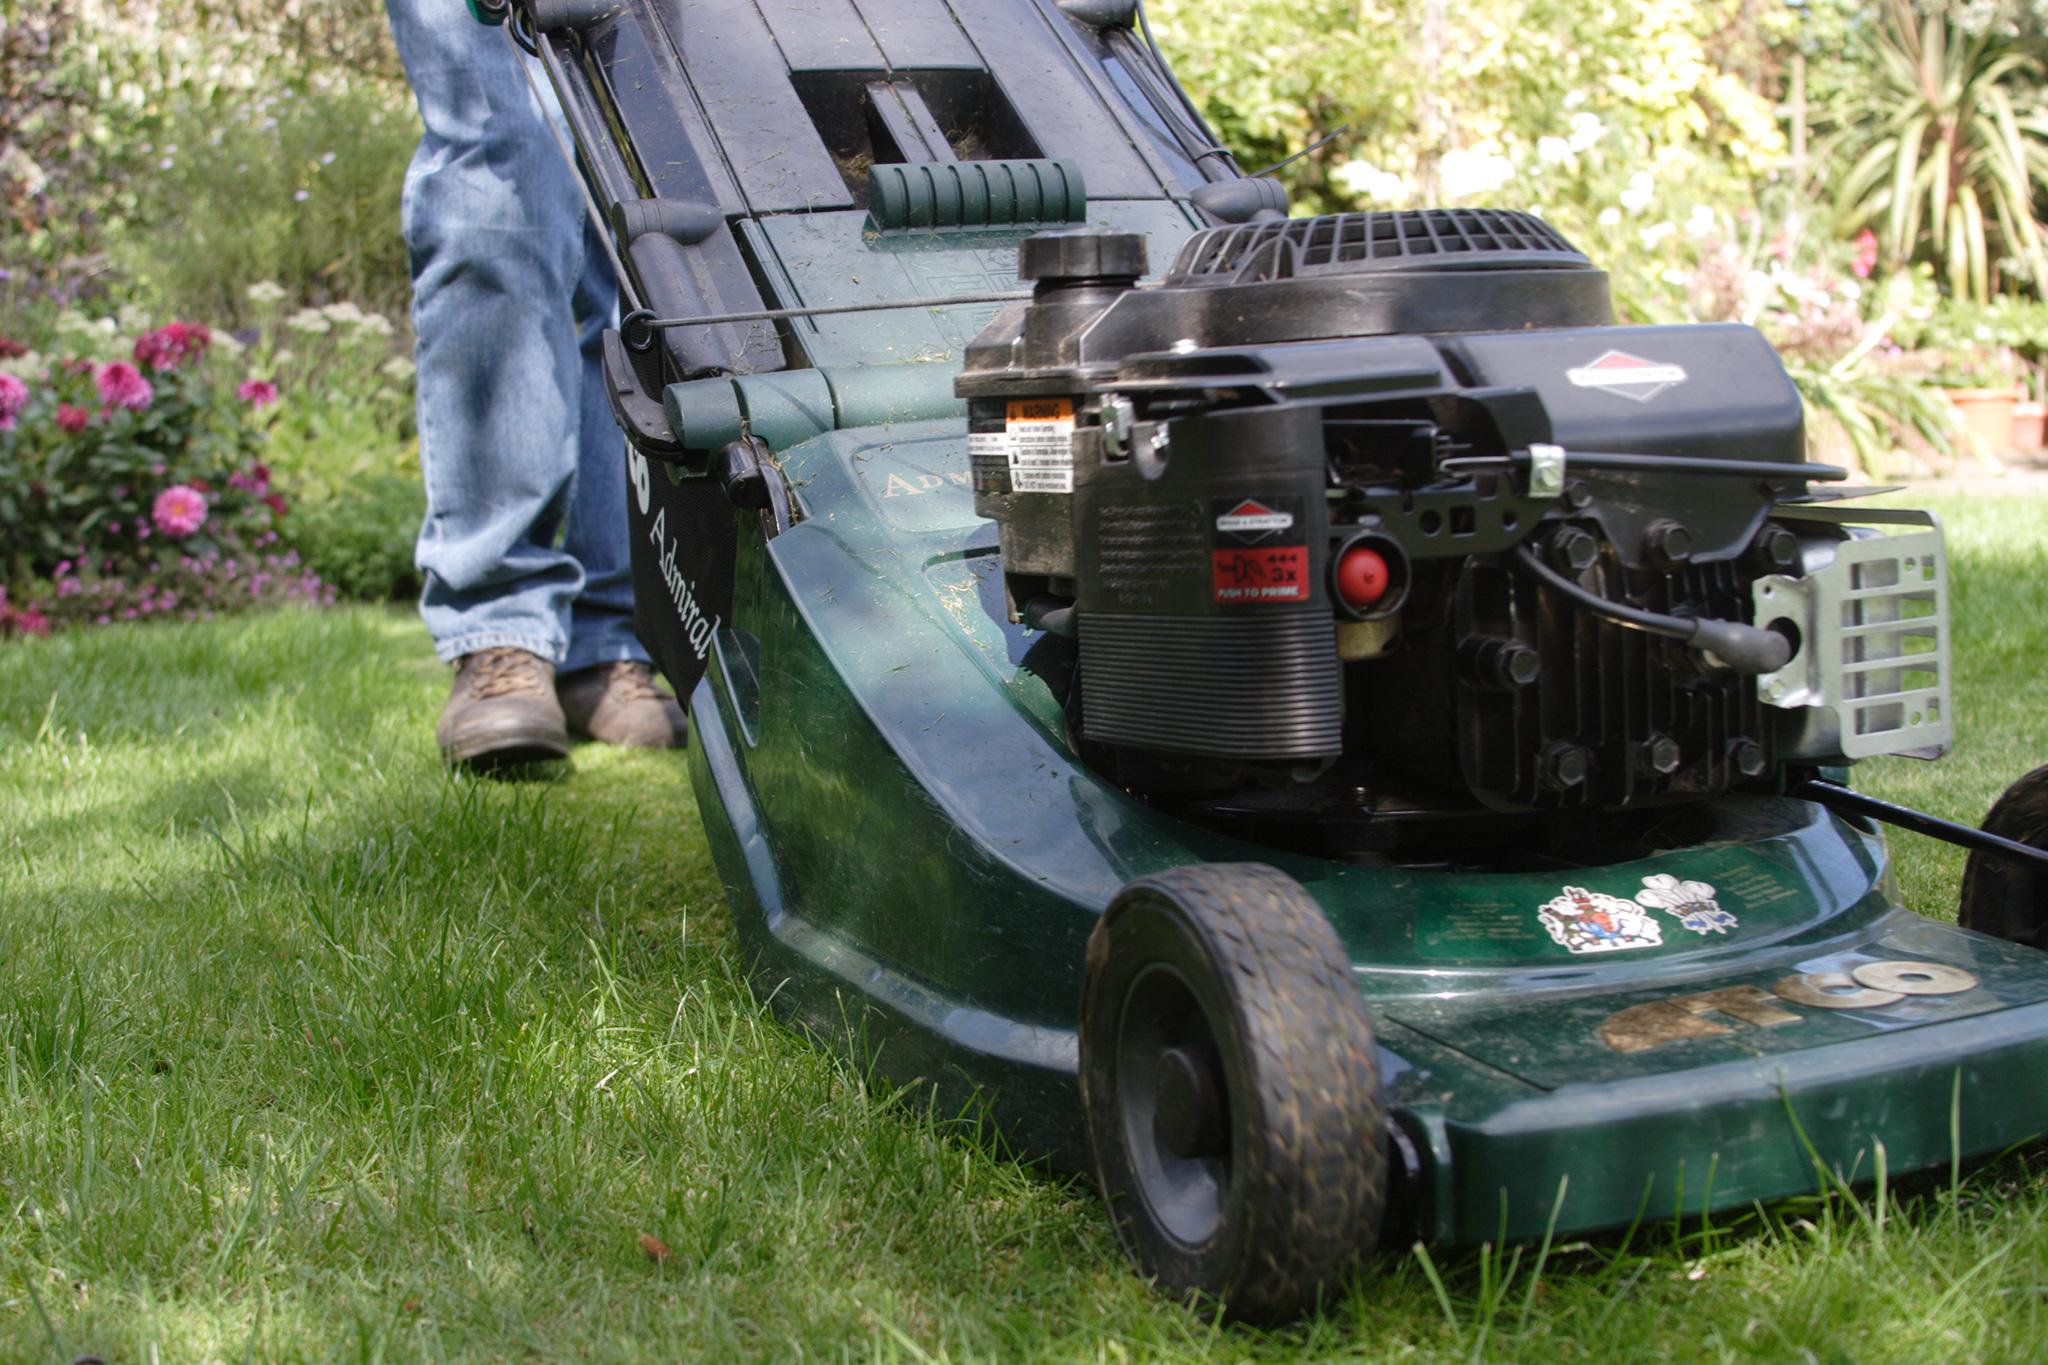 raise-the-mower-blades-to-keep-grass-long-2